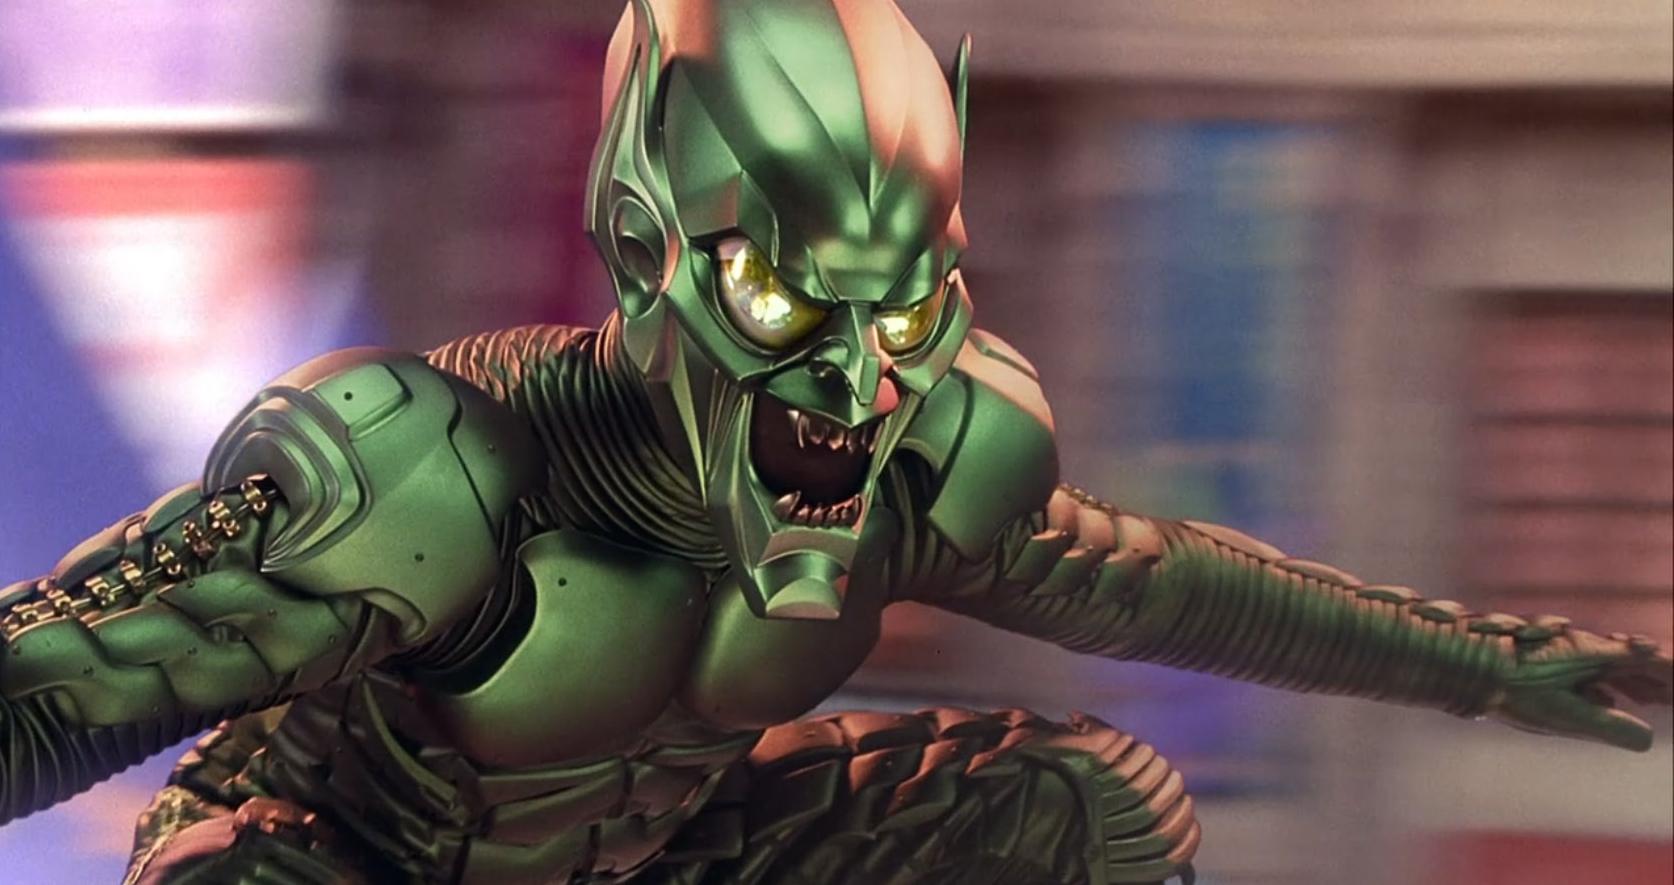 willem dafoe s green goblin was the best superhero villain actually